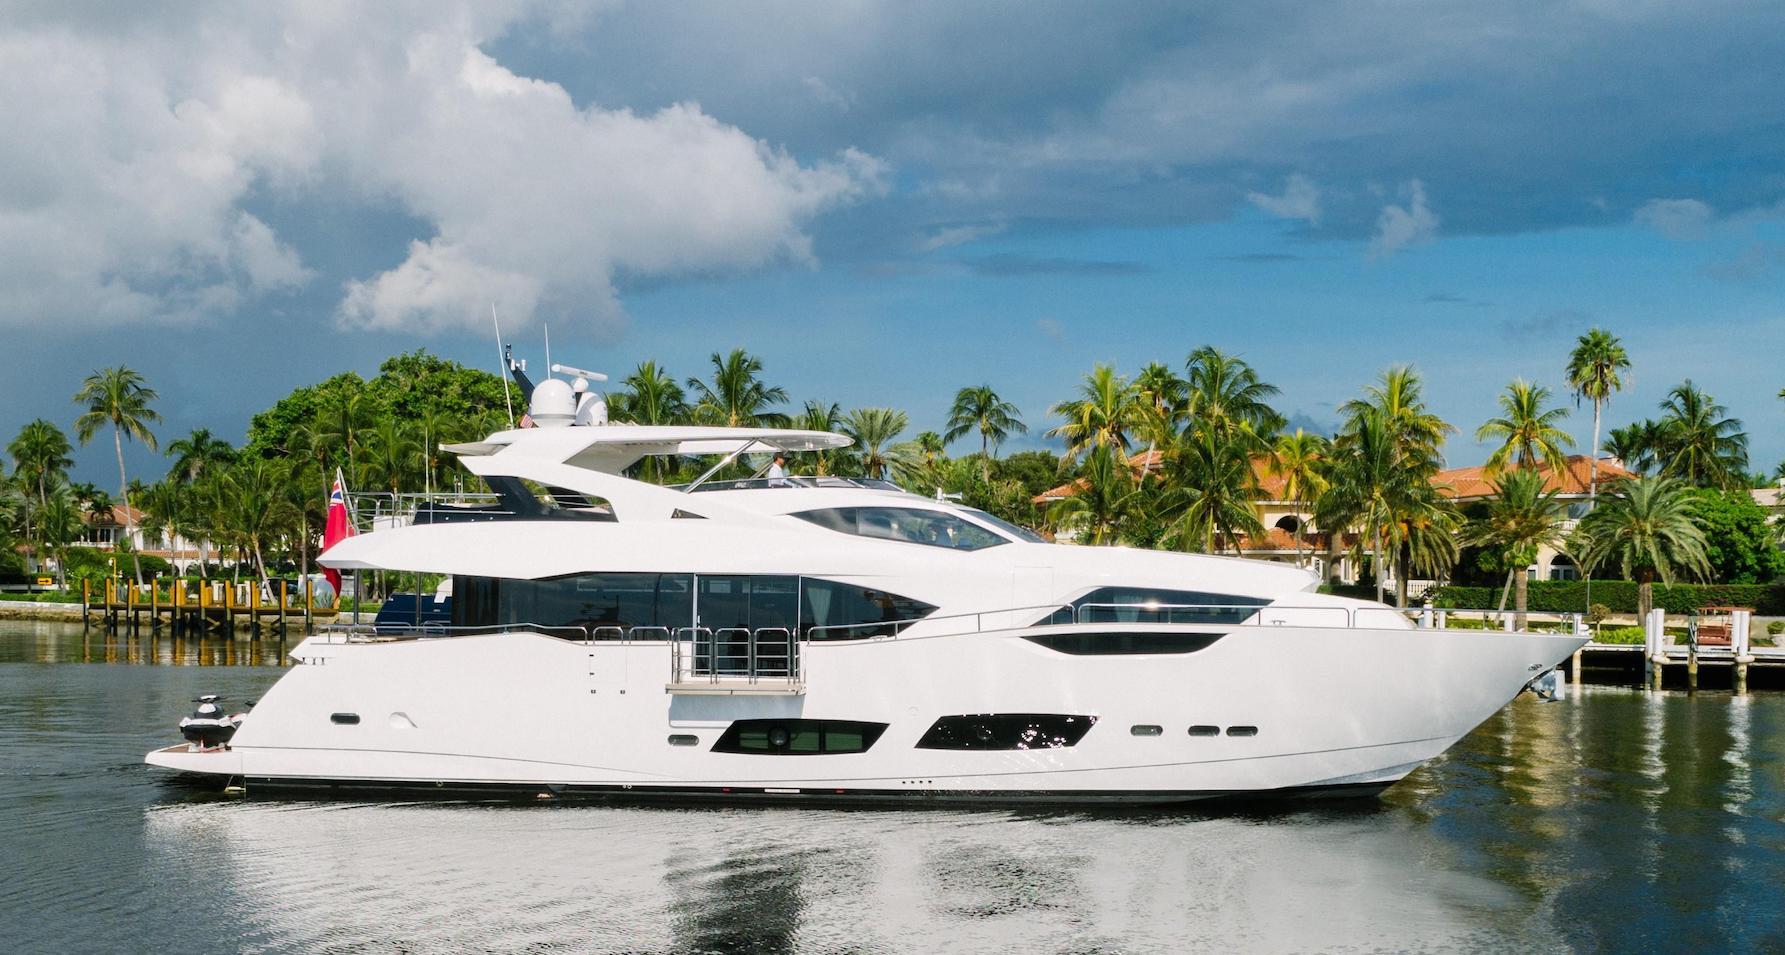 95′ Sunseeker Sold By Yacht Broker David Johnson